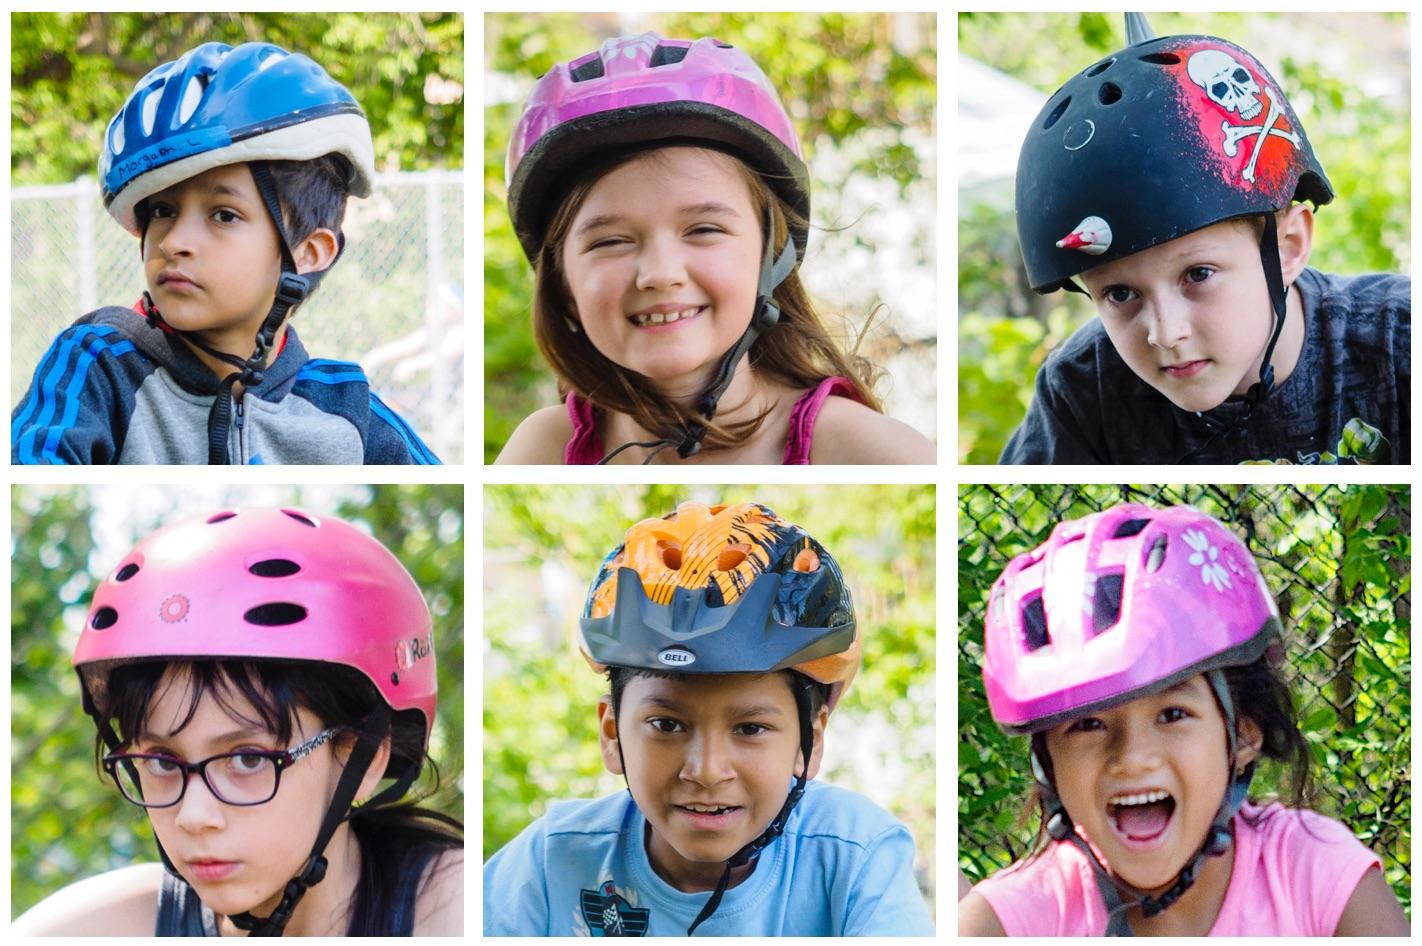 bike_smart_kids_montage.jpg